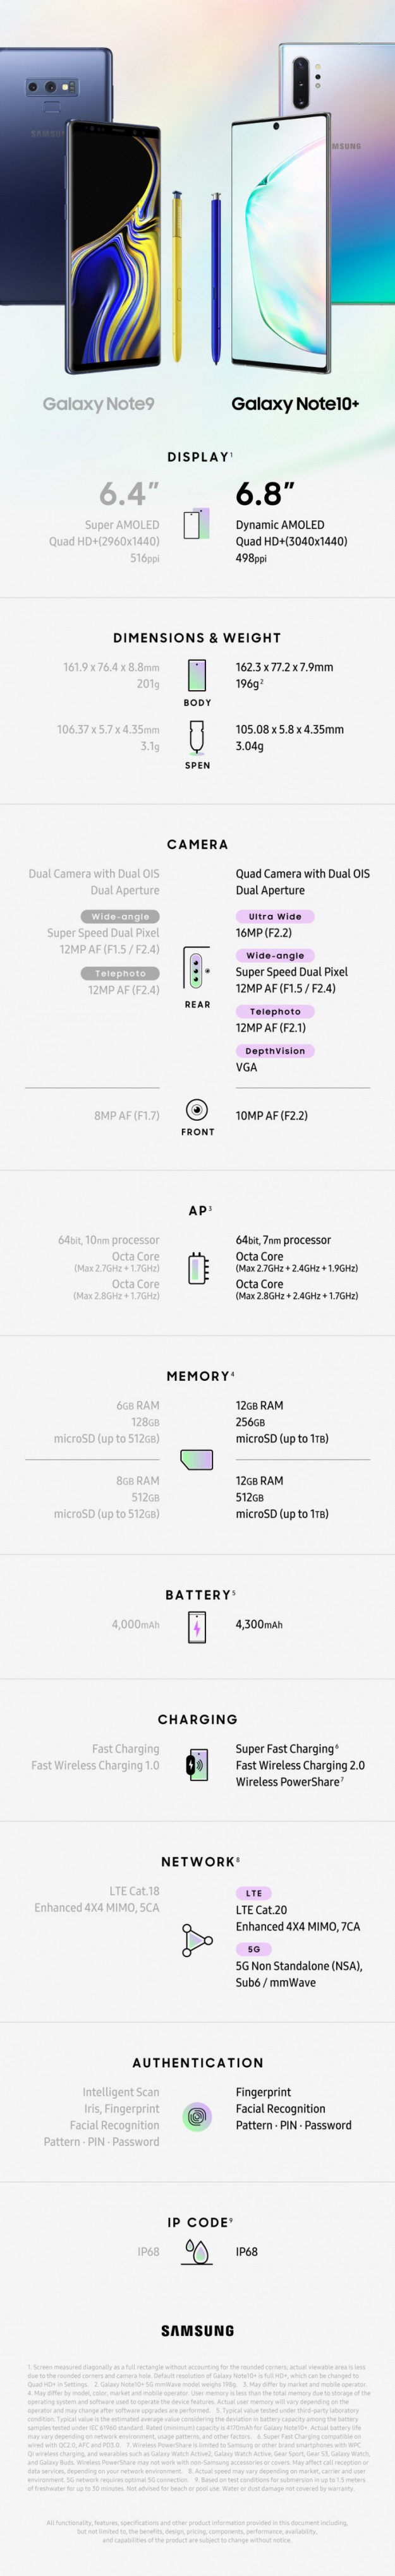 Samsung Galaxy Note 10+ против Galaxy Note 9: инфографика